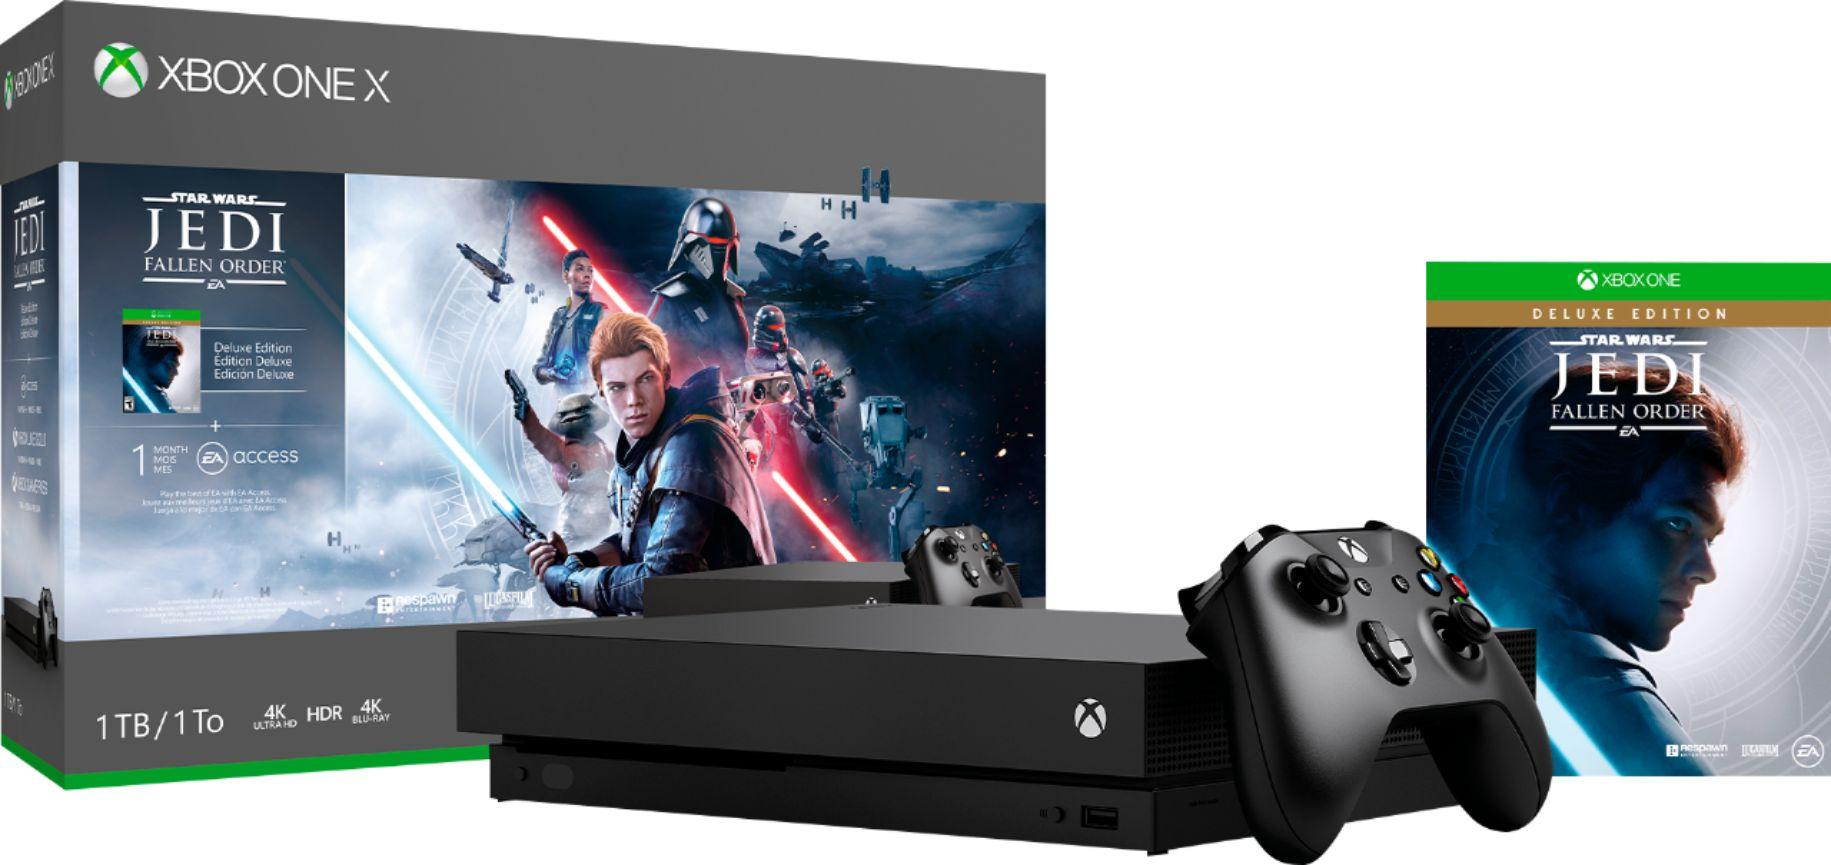 $299 Xbox One X 1TB Star Wars Jedi: Fallen Order Console Bundle BACK IN STOCK.